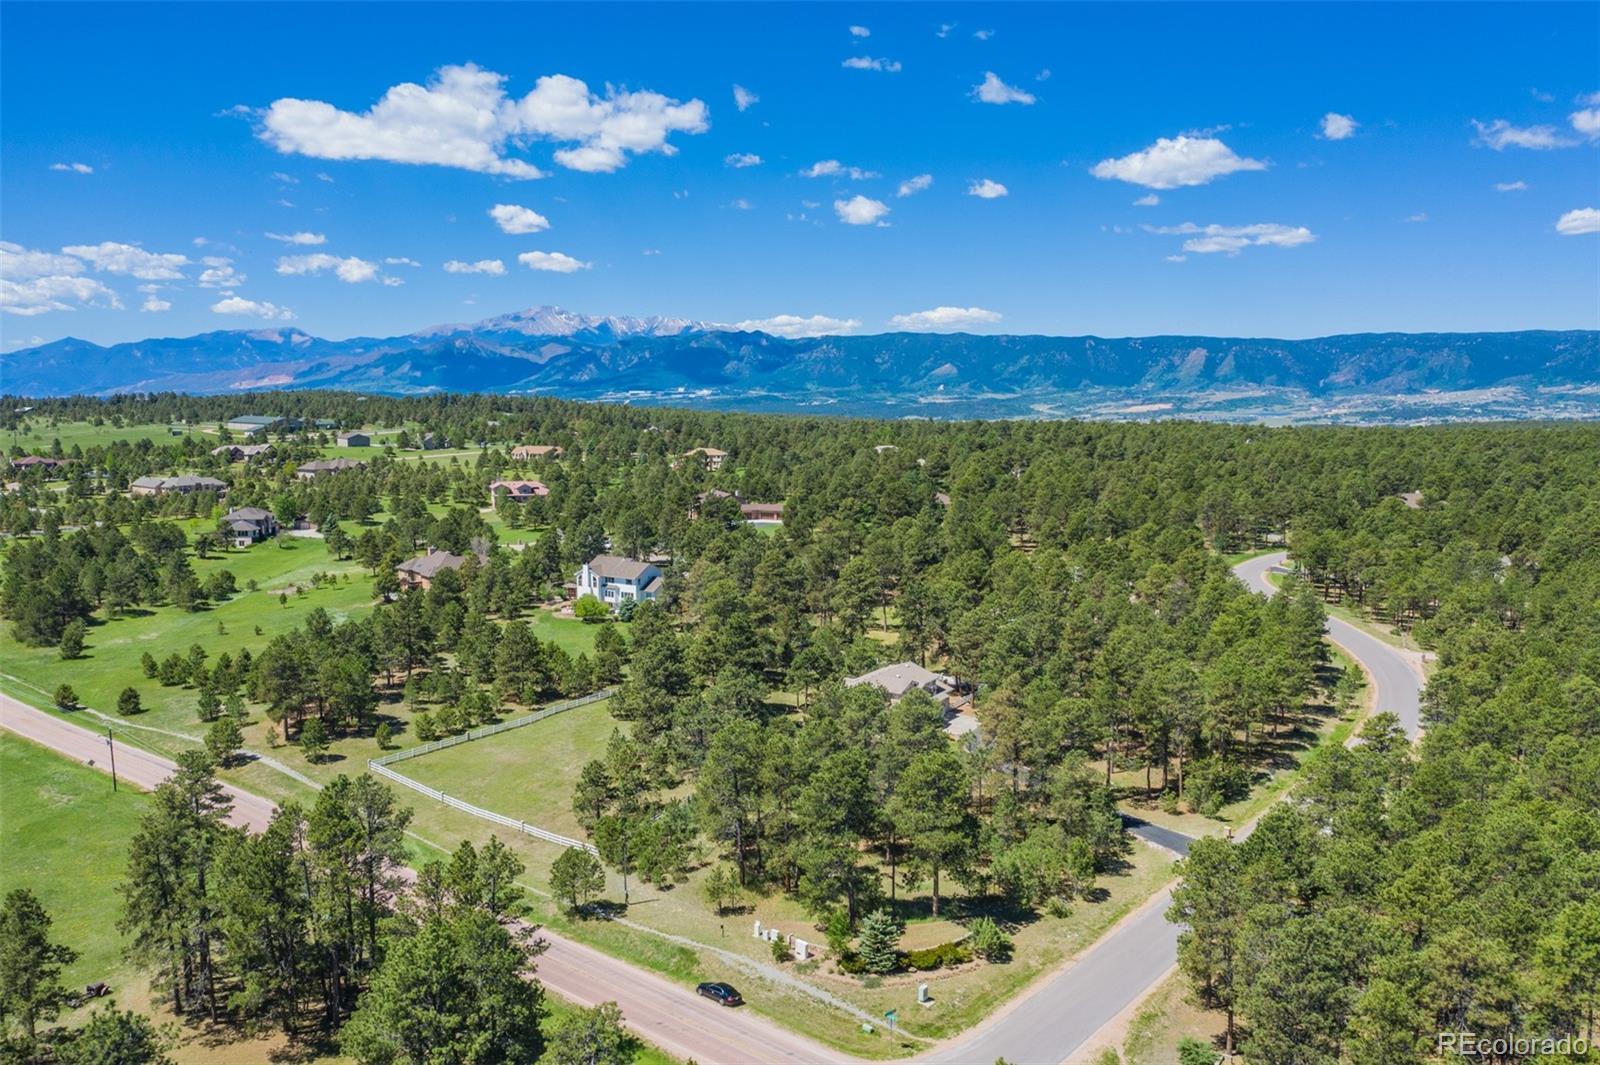 MLS# 2707350 - 6 - 17310 Charter Pines , Colorado Springs, CO 80132